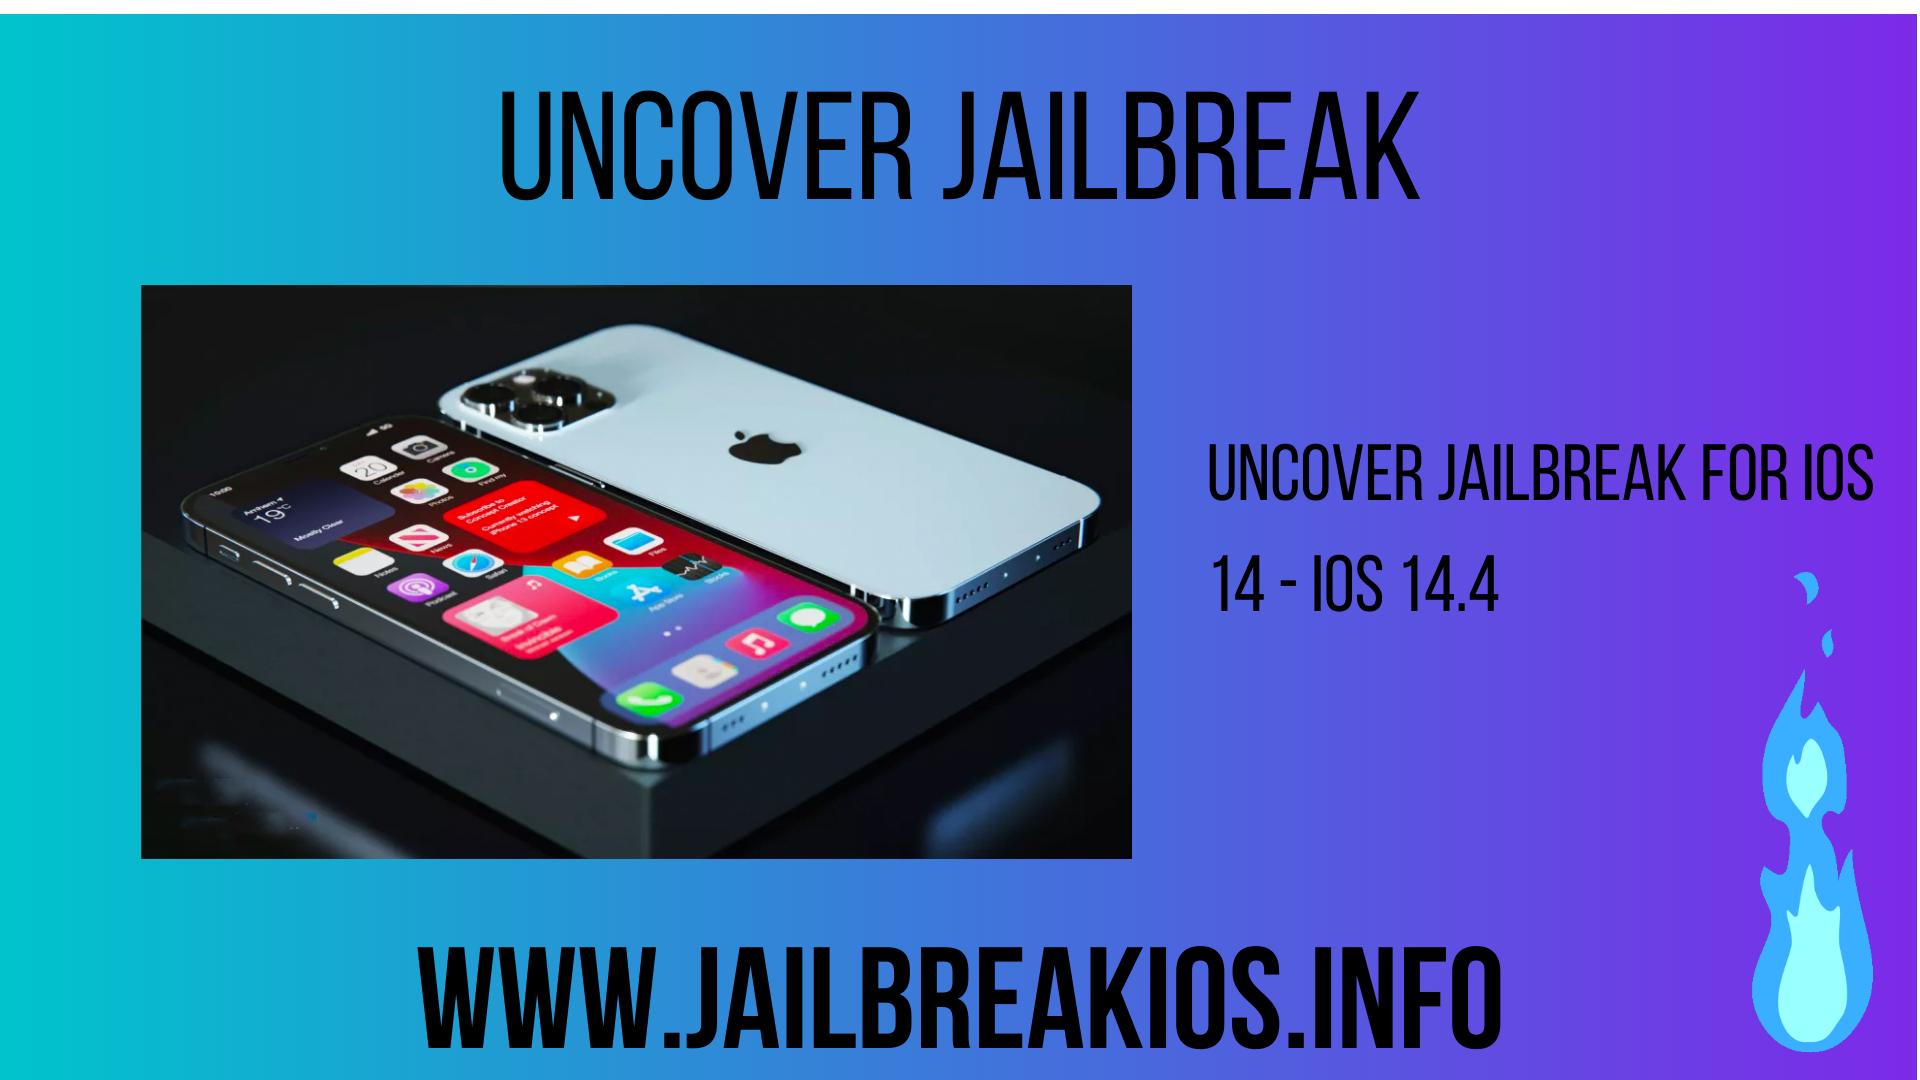 https://jailbreakios.info/